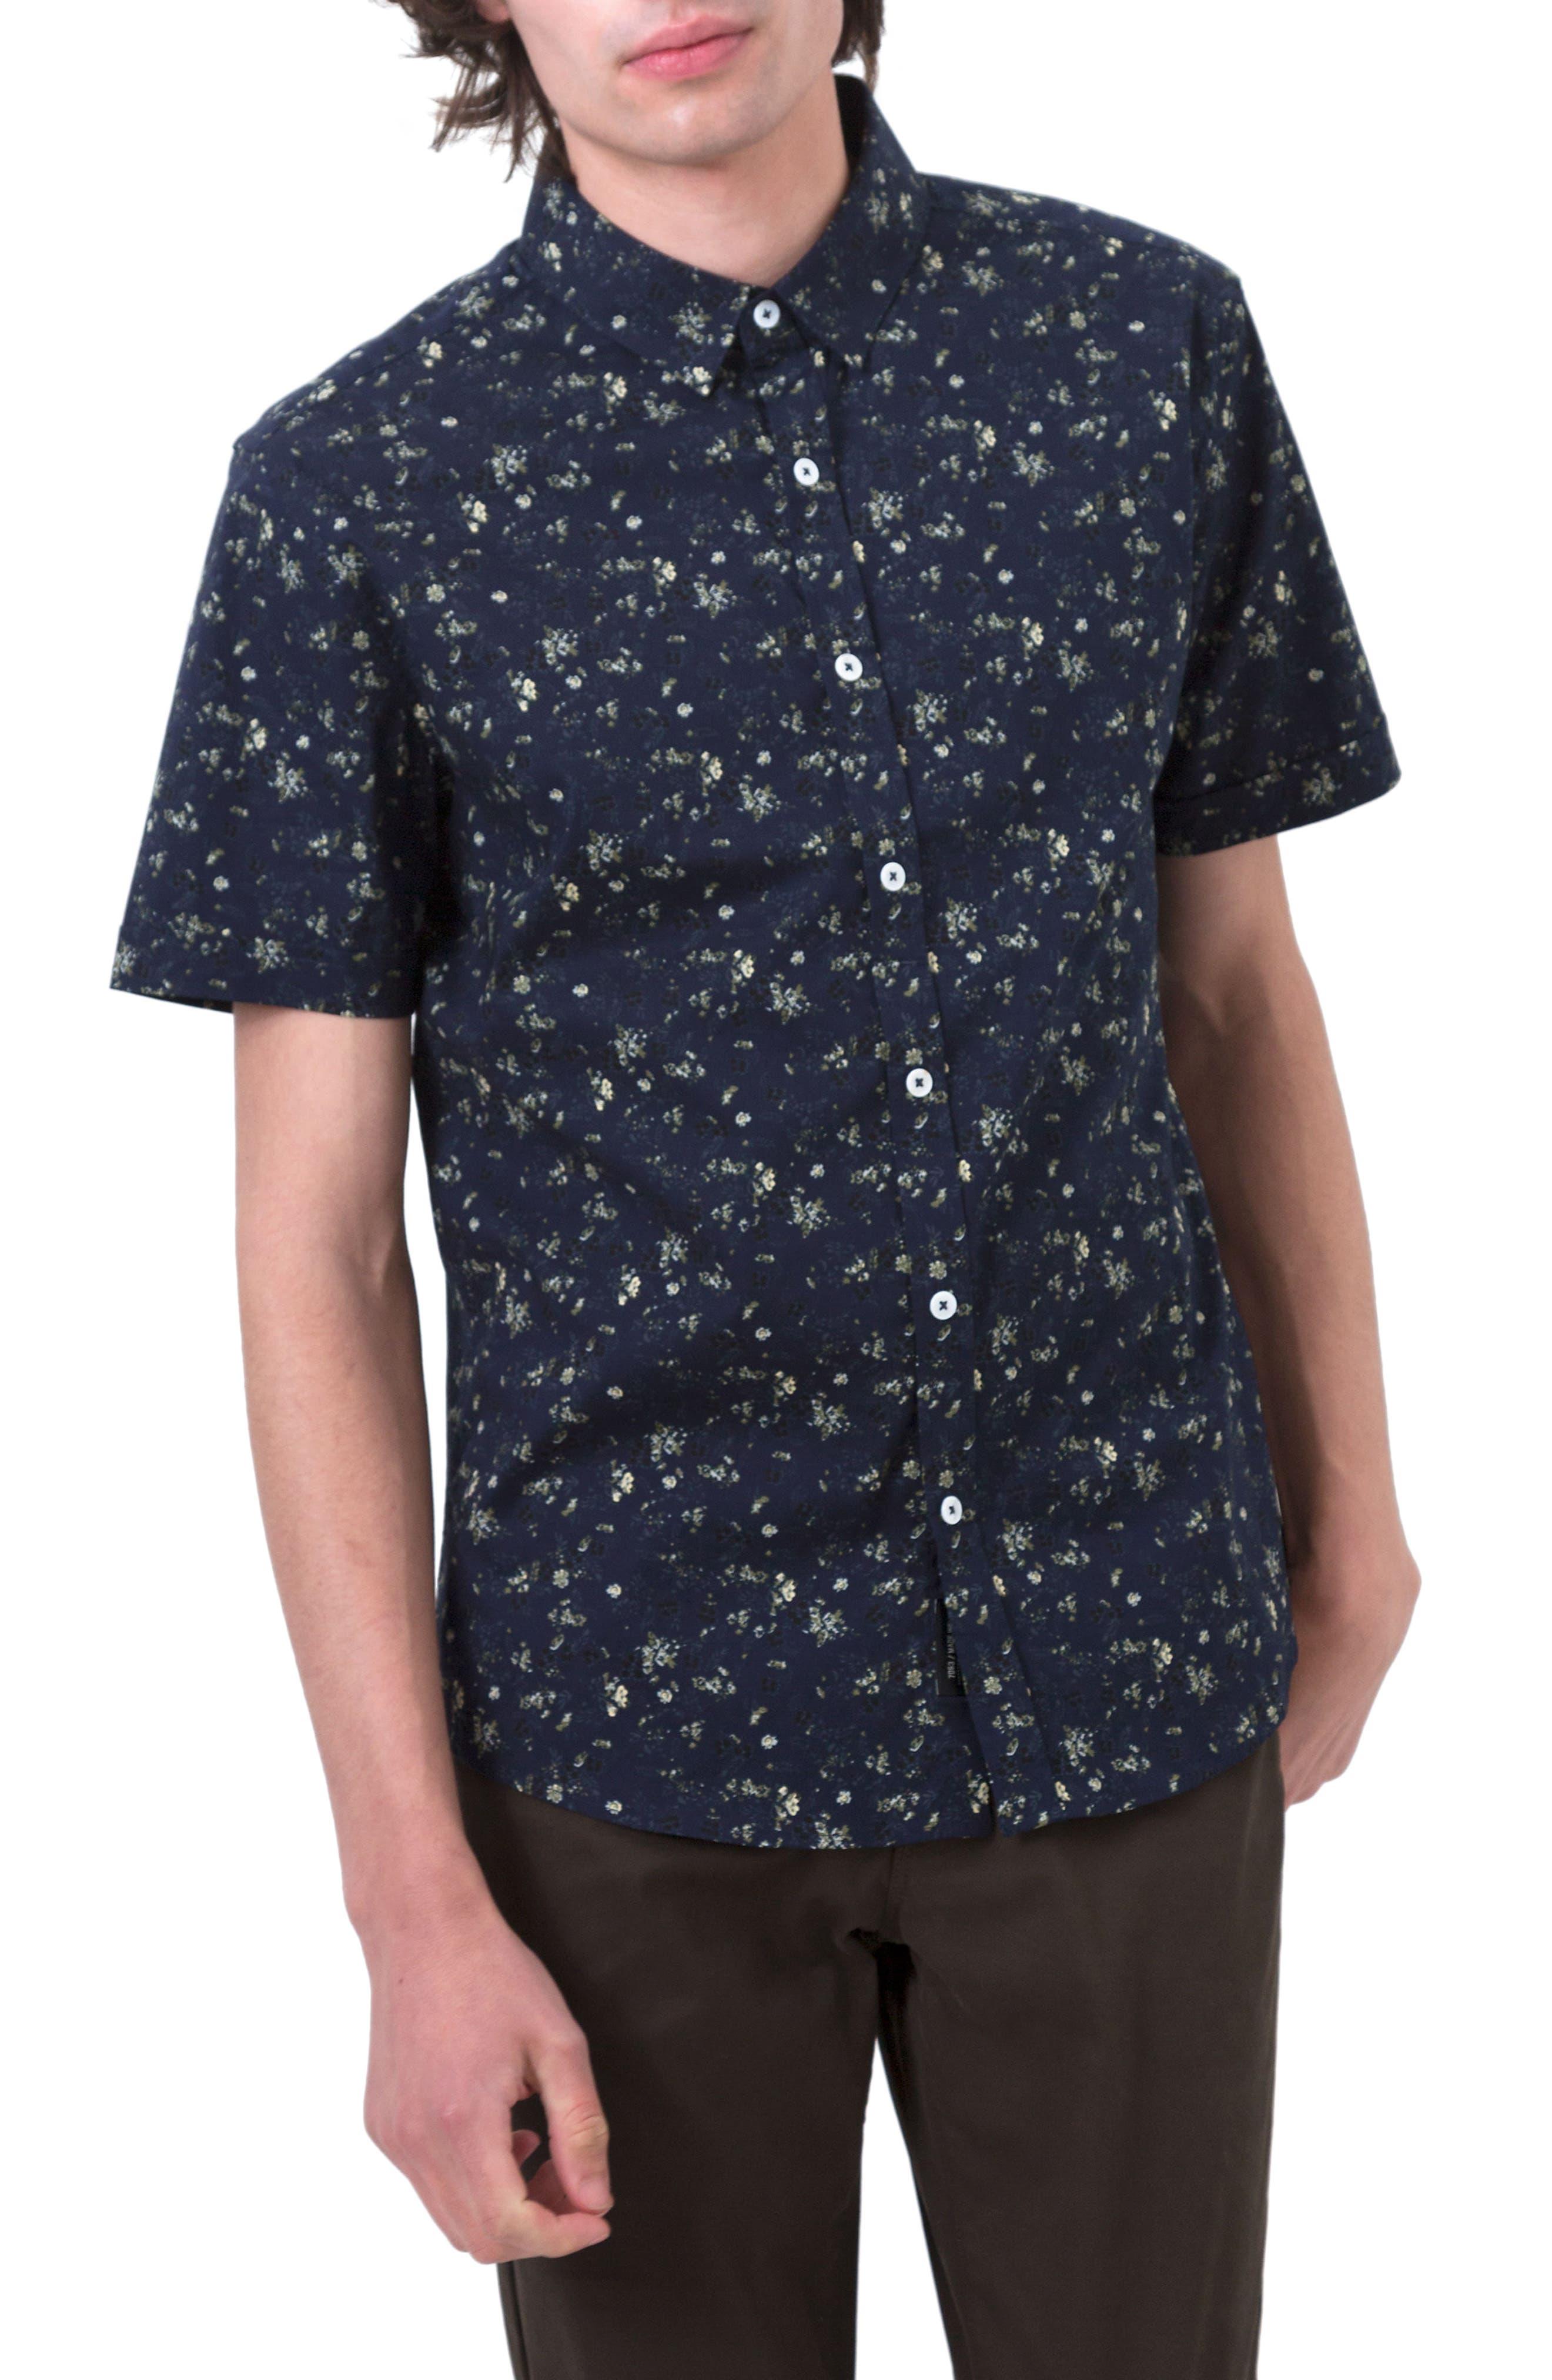 Jungle Youth Trim Fit Short Sleeve Sport Shirt,                             Main thumbnail 1, color,                             410